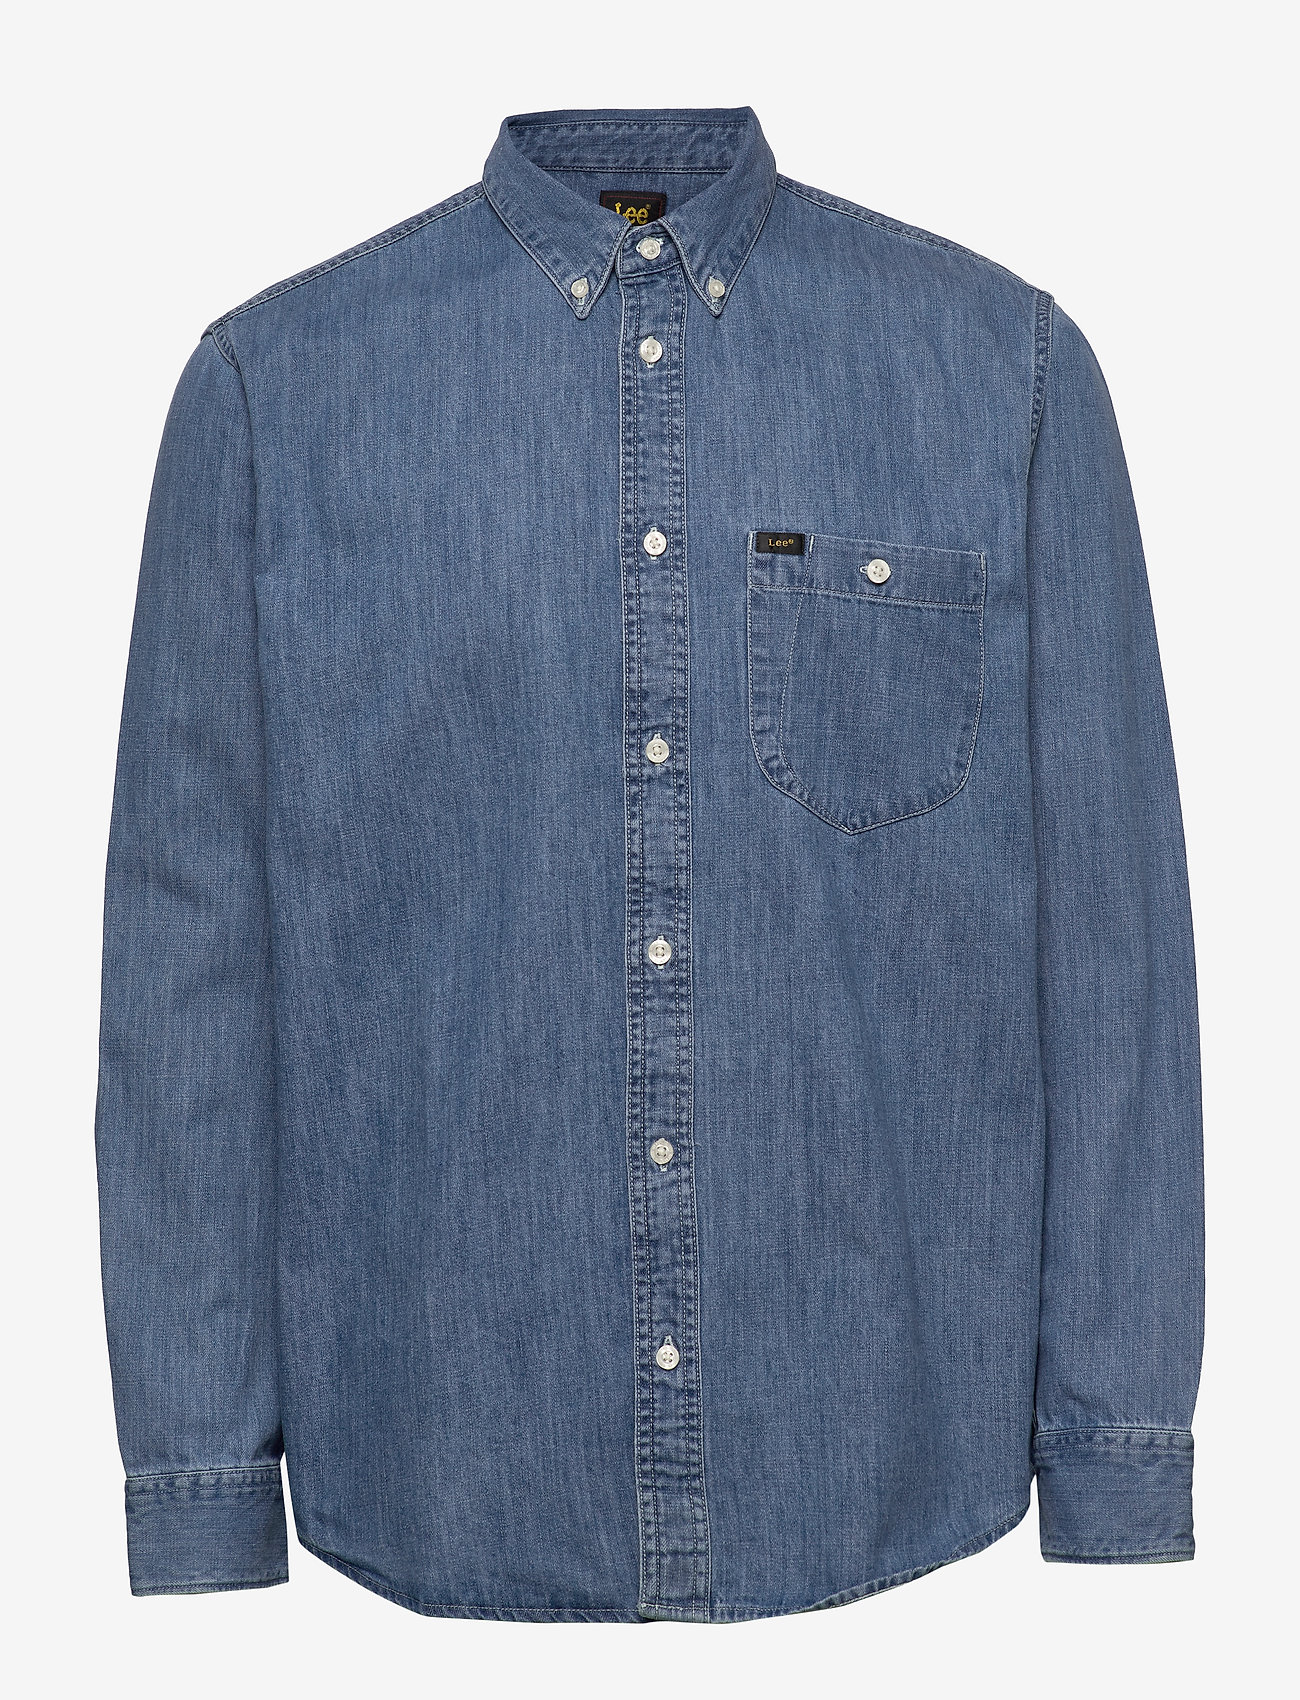 Lee Jeans - RIVETED SHIRT - peruspaitoja - washed blue - 0